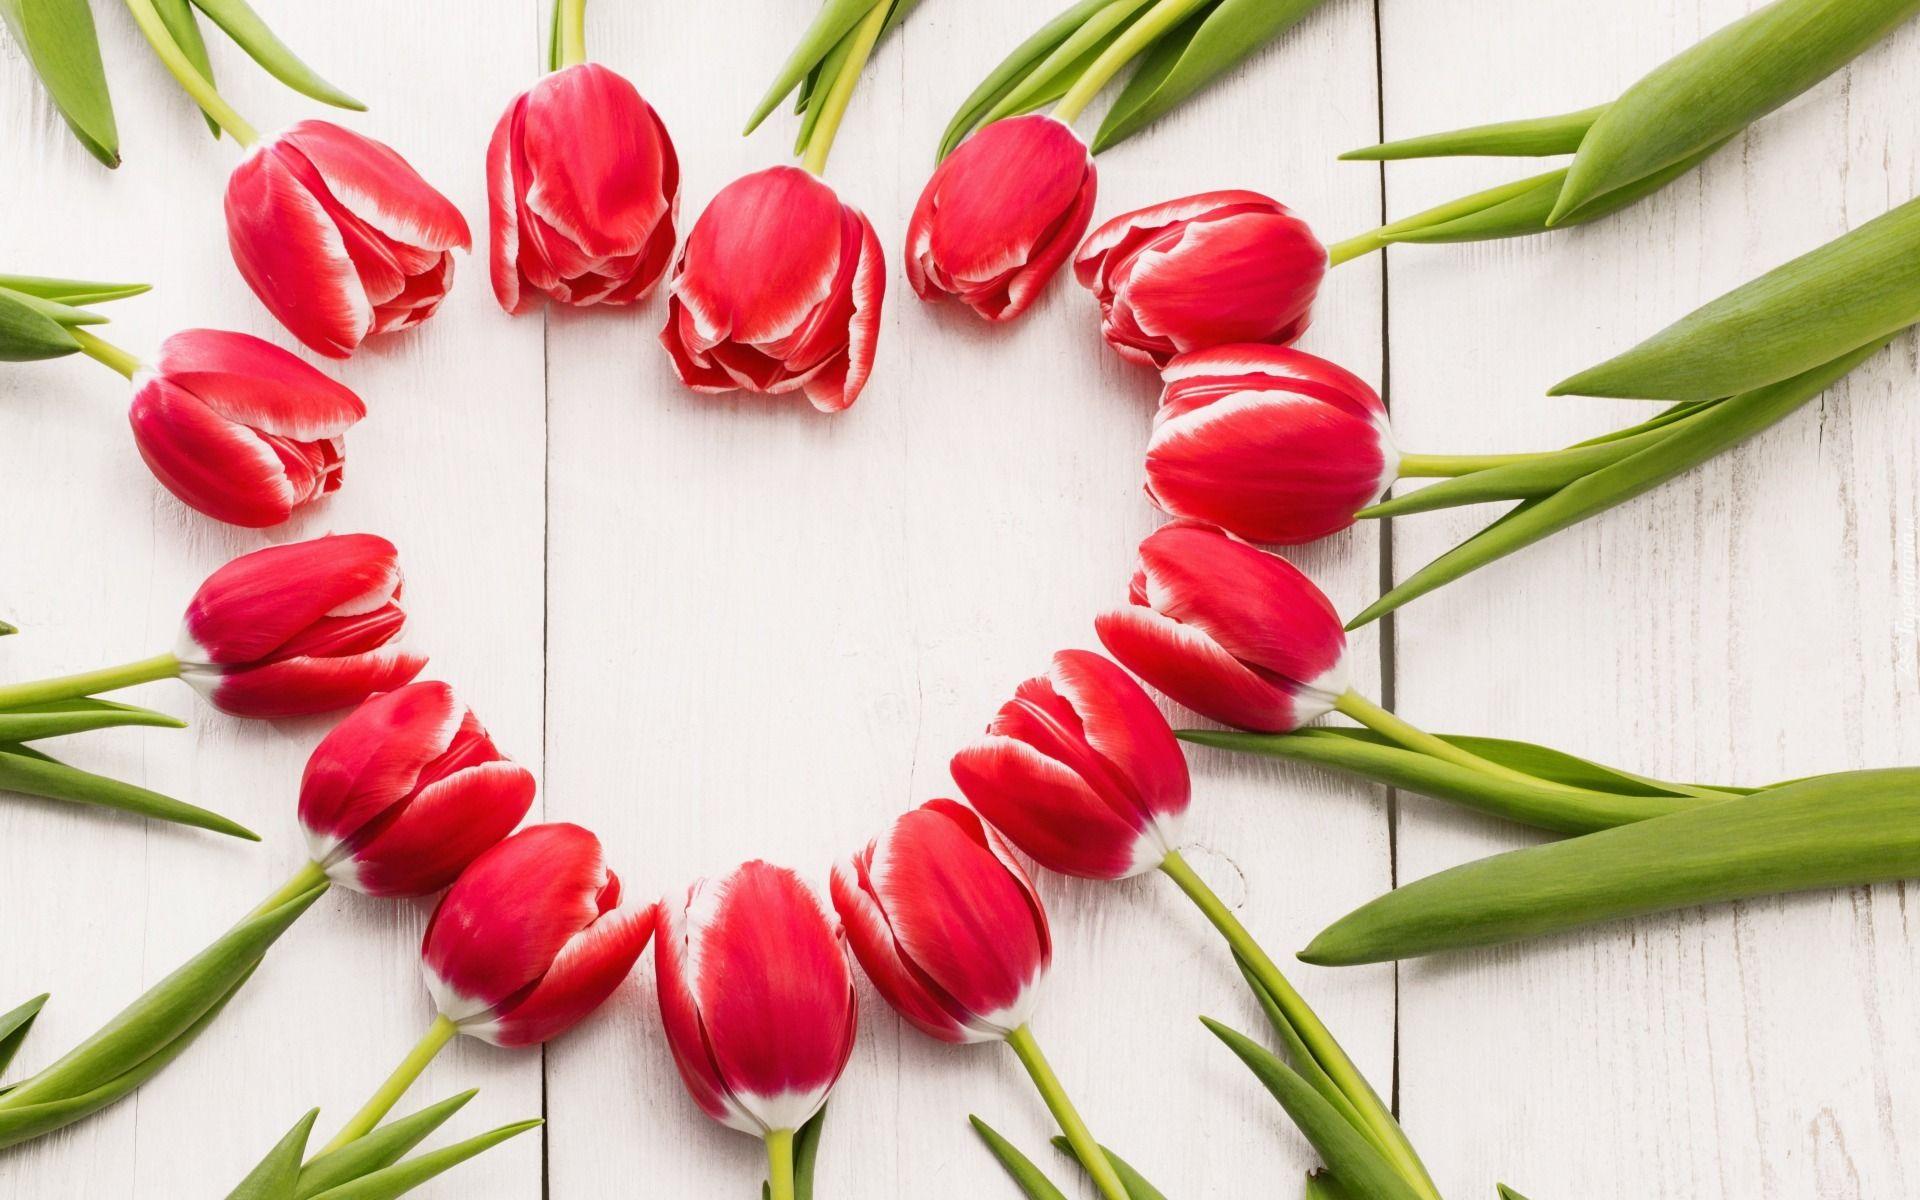 Kwiaty Tulipany Wiosna Serce Red Tulips Tulips Flower Images